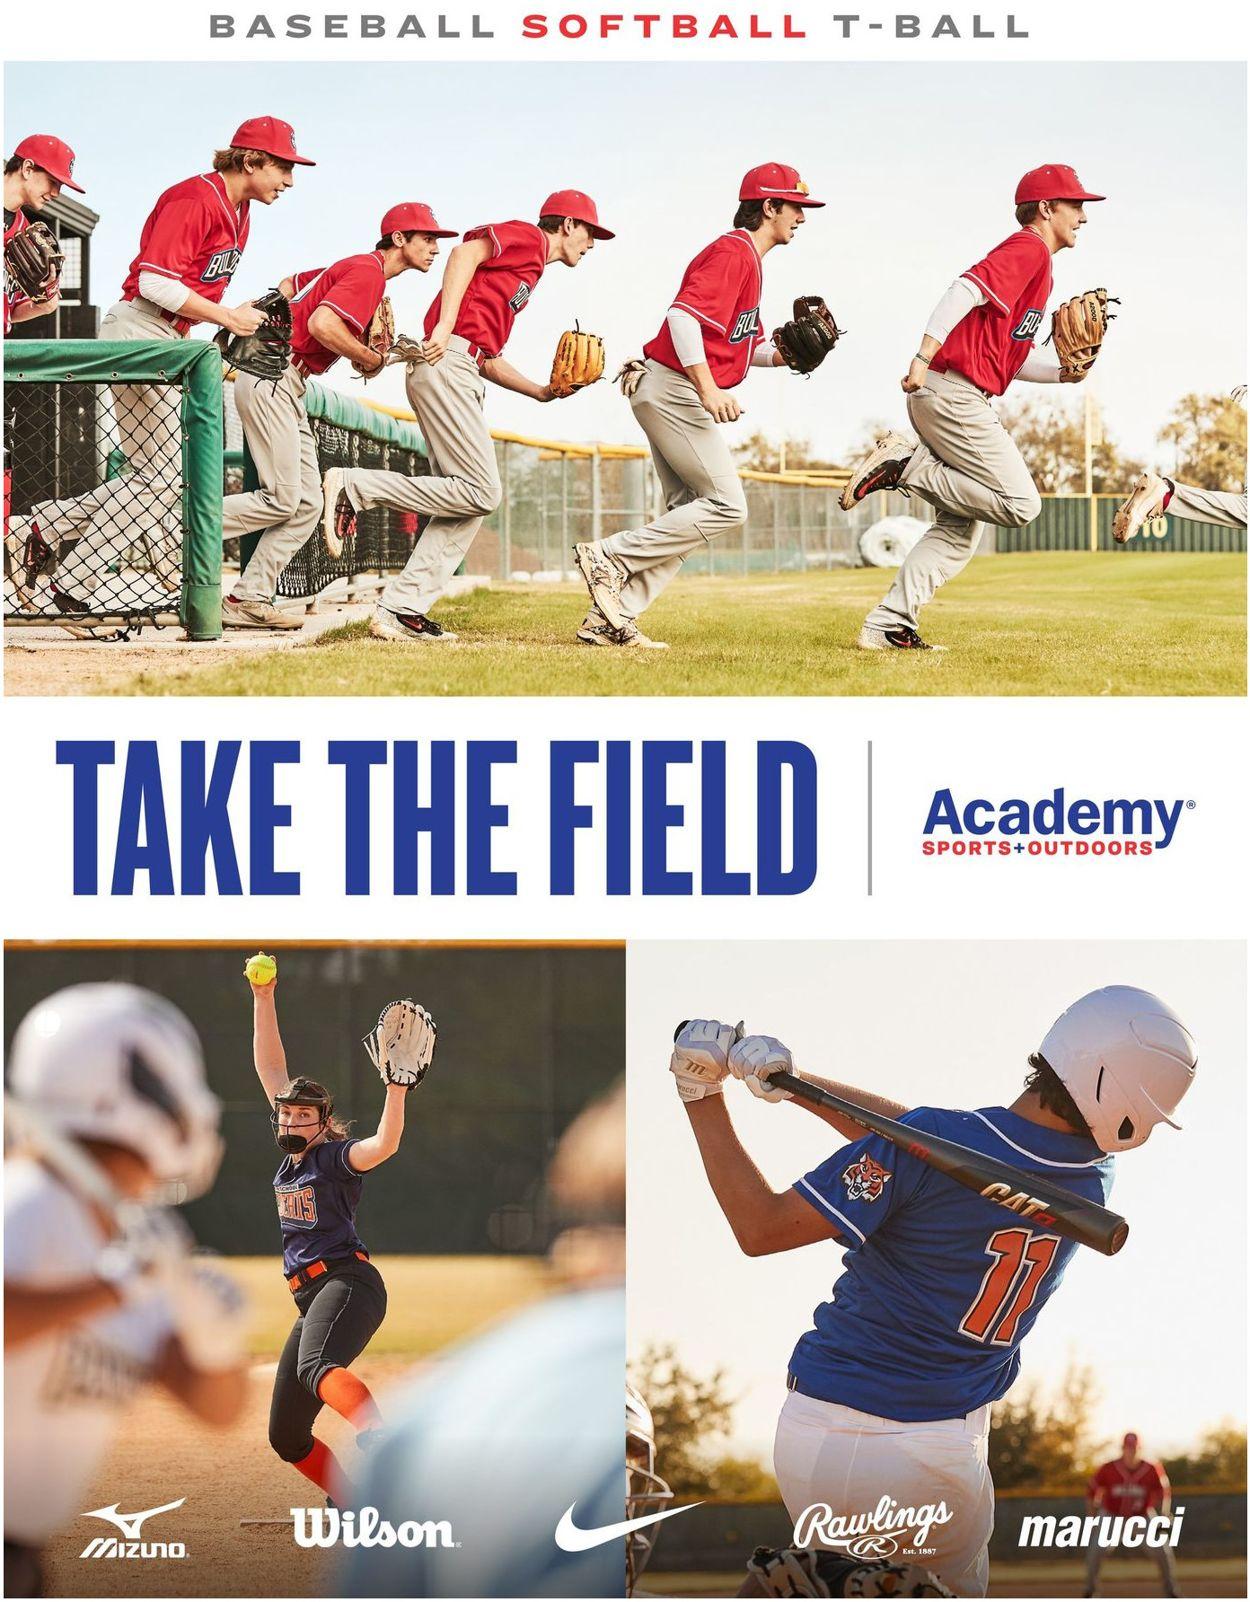 Academy Sports Baseball Gear Guide 2021 Weekly Ad Circular - valid 02/01-03/28/2021